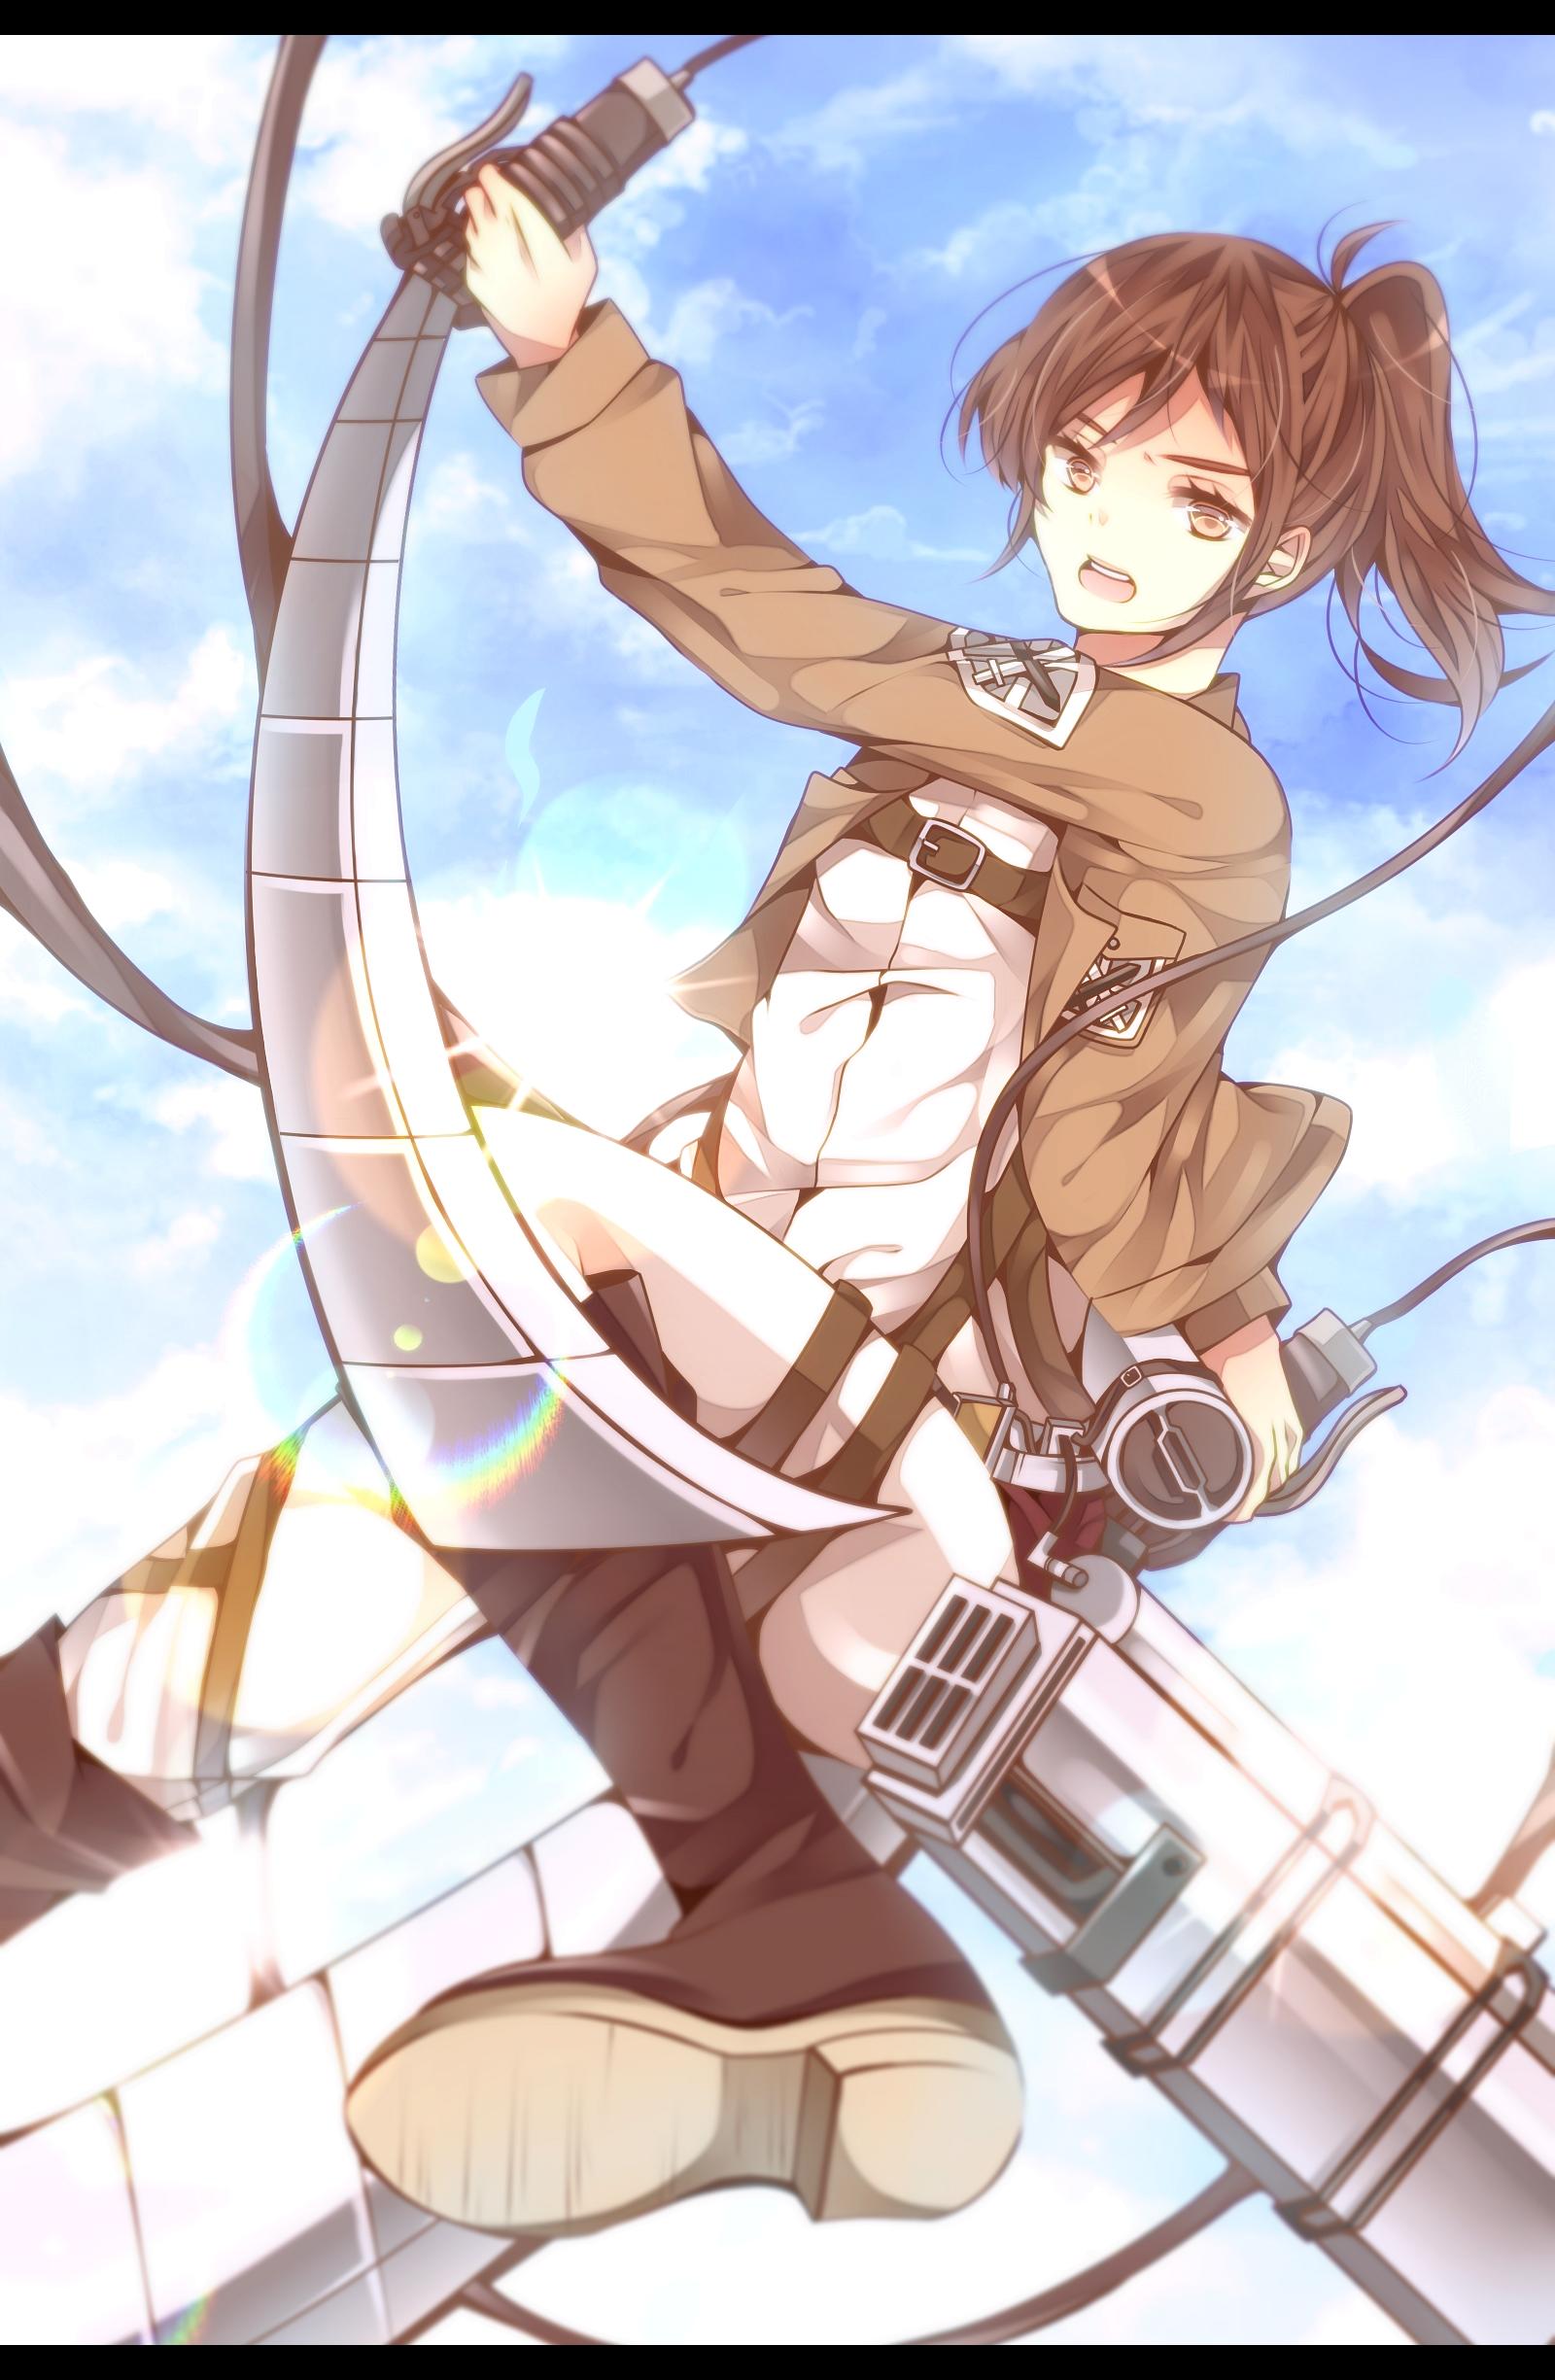 Sasha Braus Sasha Blouse Attack On Titan Mobile Wallpaper 1502953 Zerochan Anime Image Board